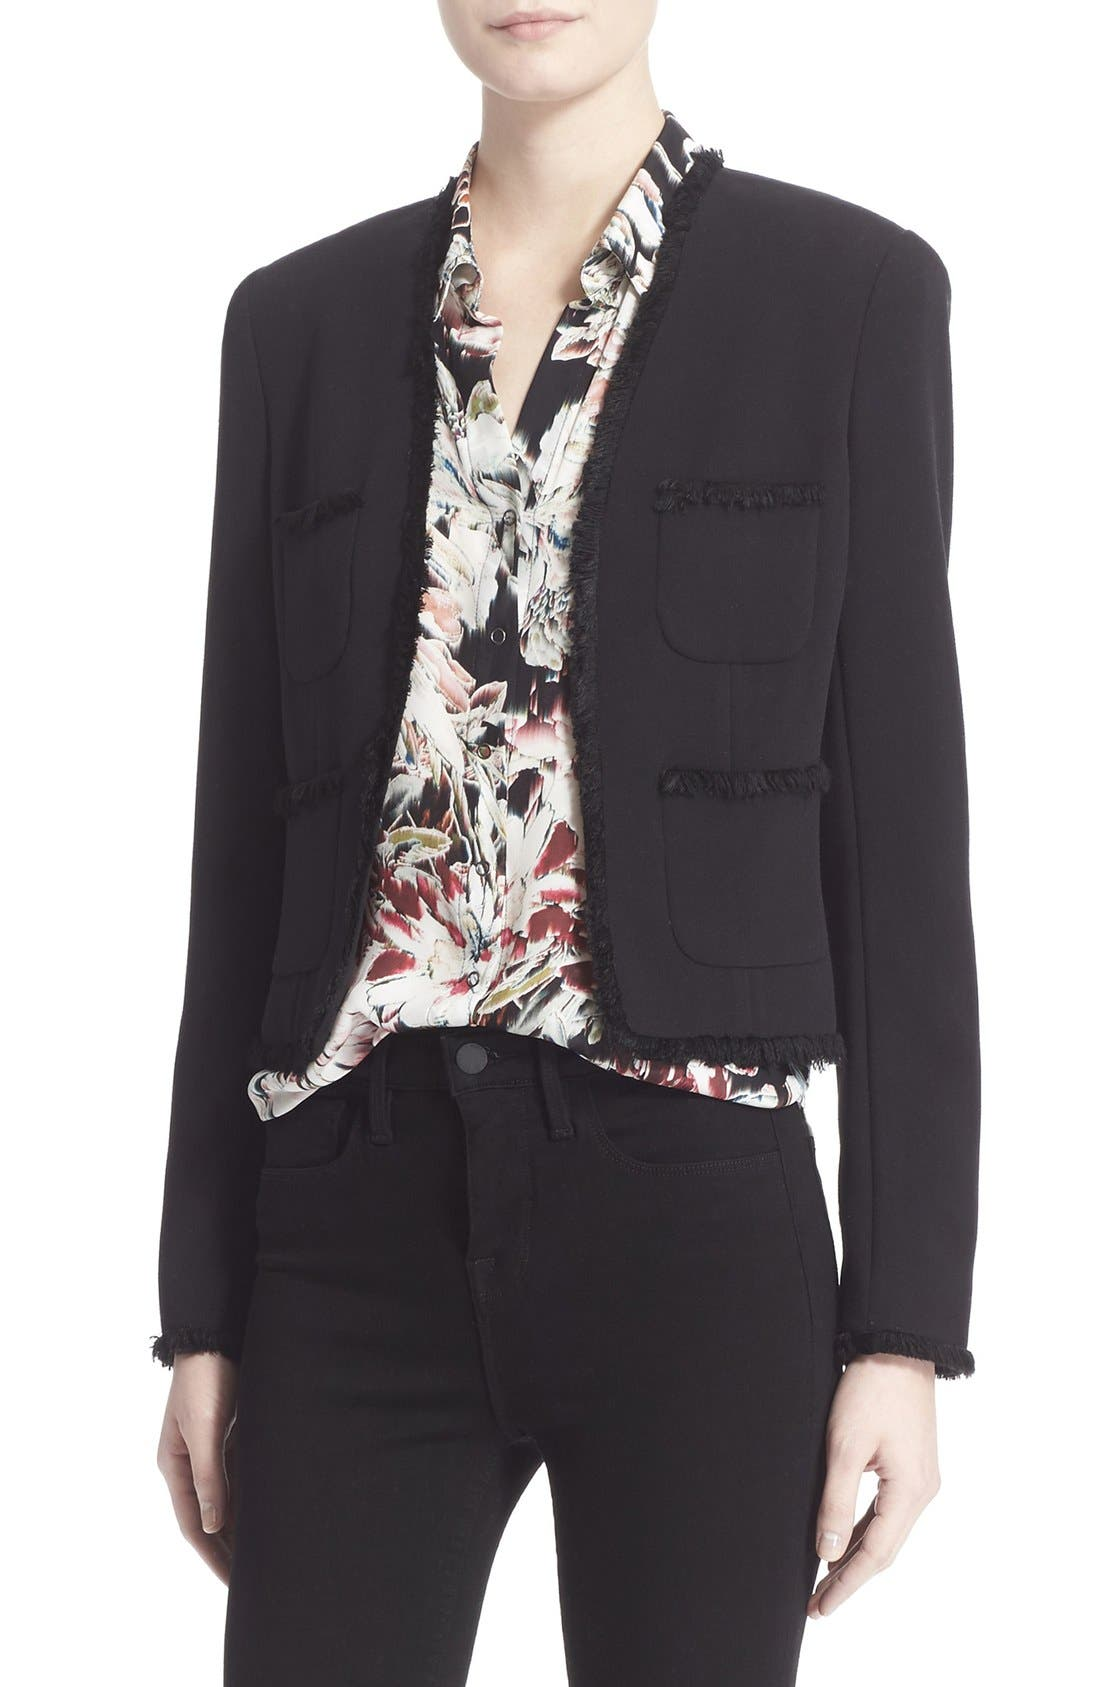 Alternate Image 1 Selected - L'AGENCE Fringe Trim Tailored Jacket